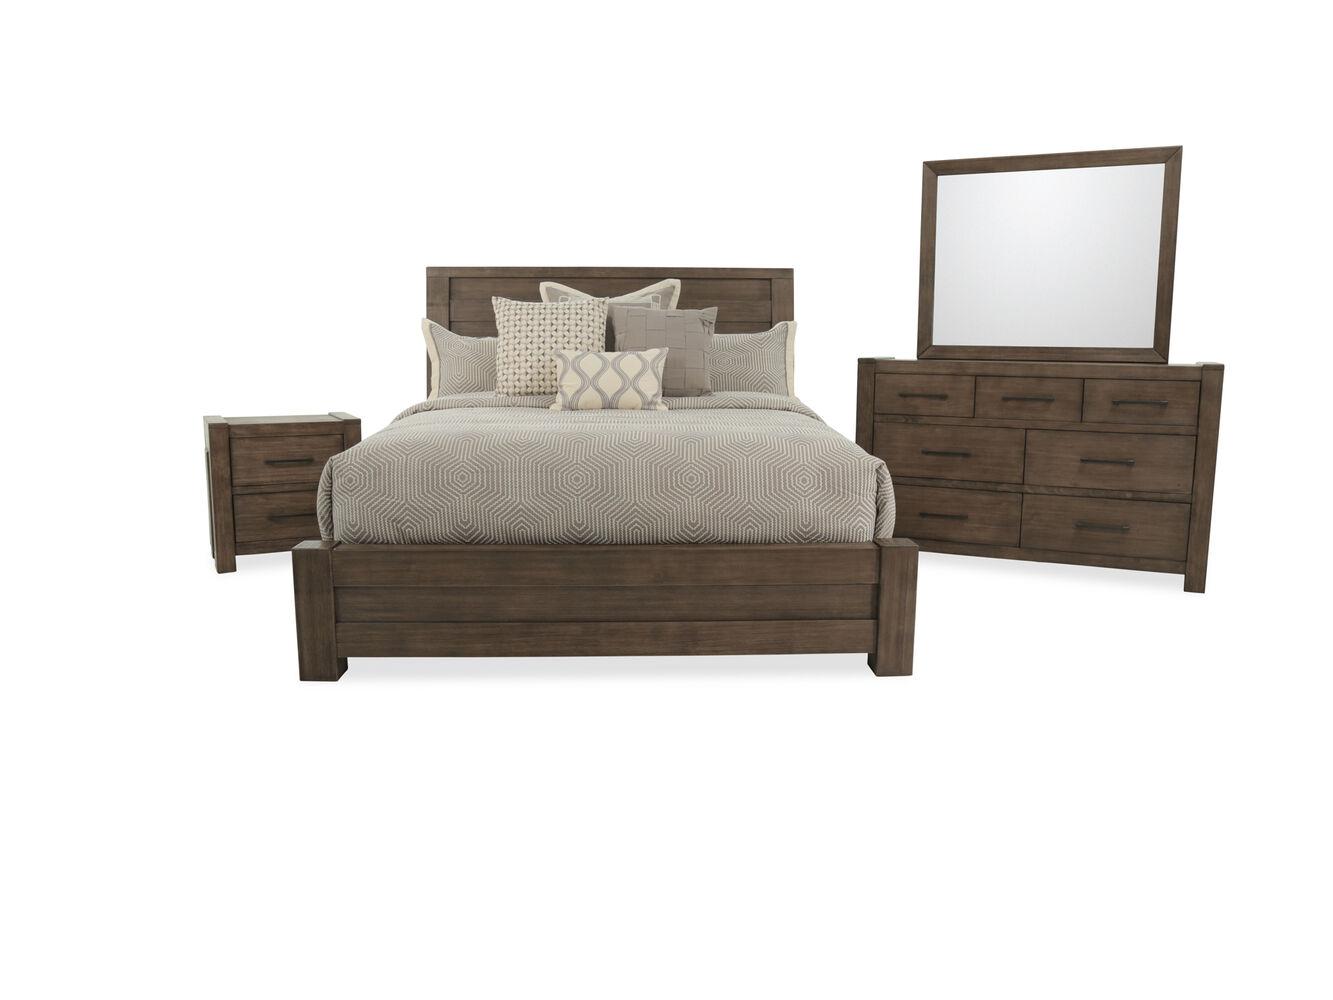 mathis brothers bedroom furniture mathis brothers bedroom sets hondurasliteraria info. Black Bedroom Furniture Sets. Home Design Ideas